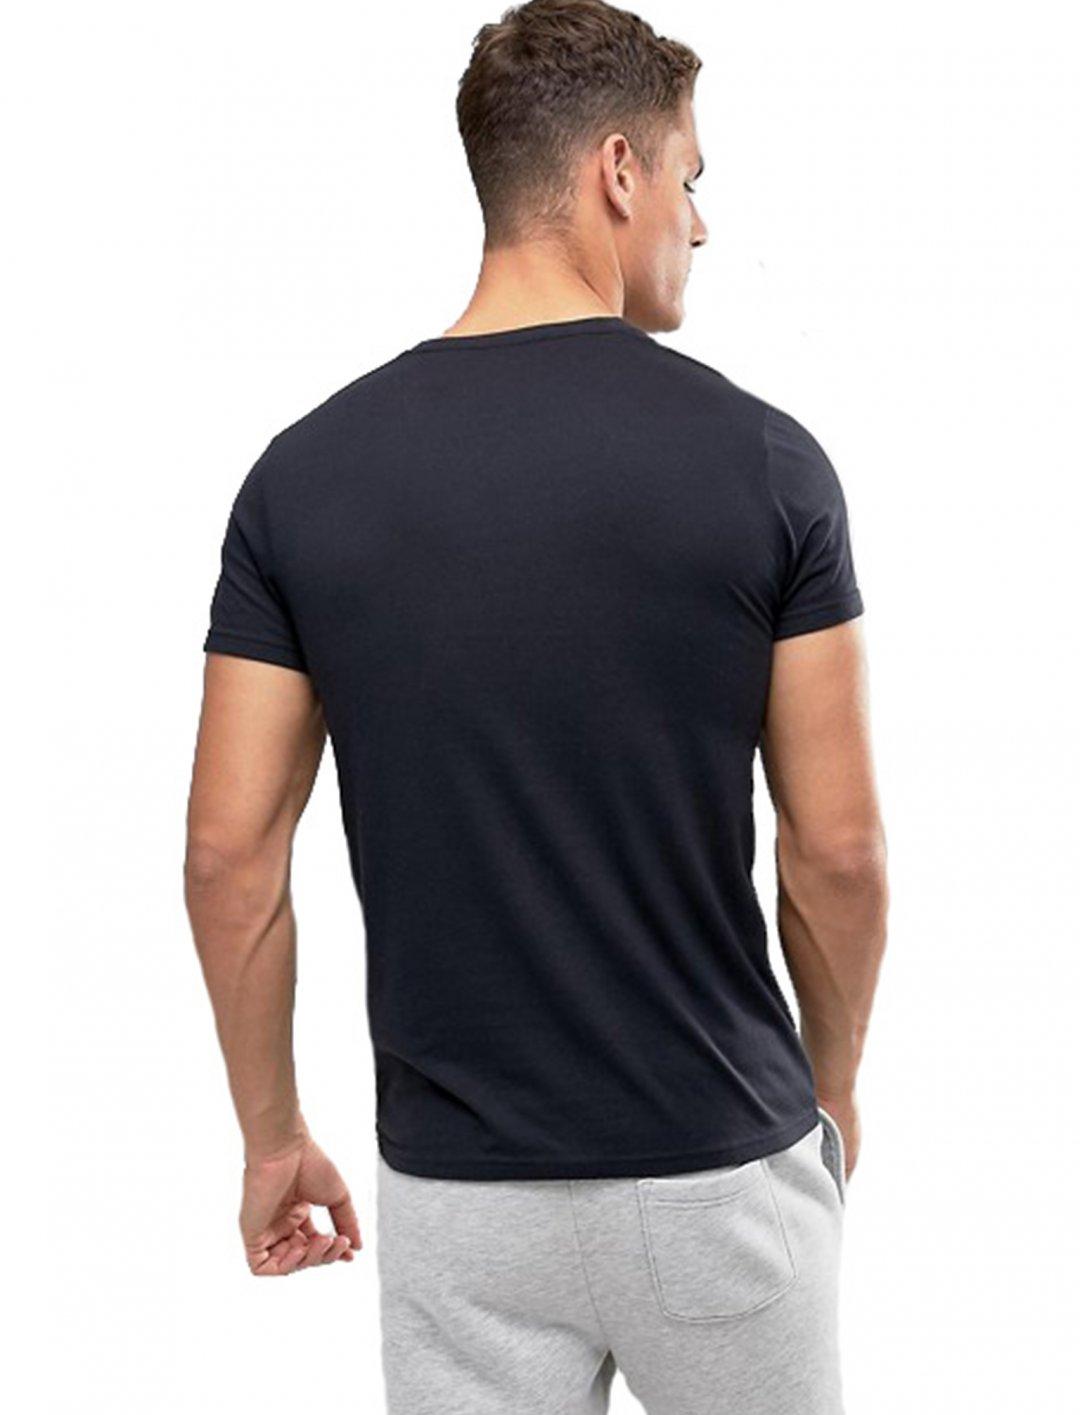 Crew Neck T-Shirt Clothing Hollister